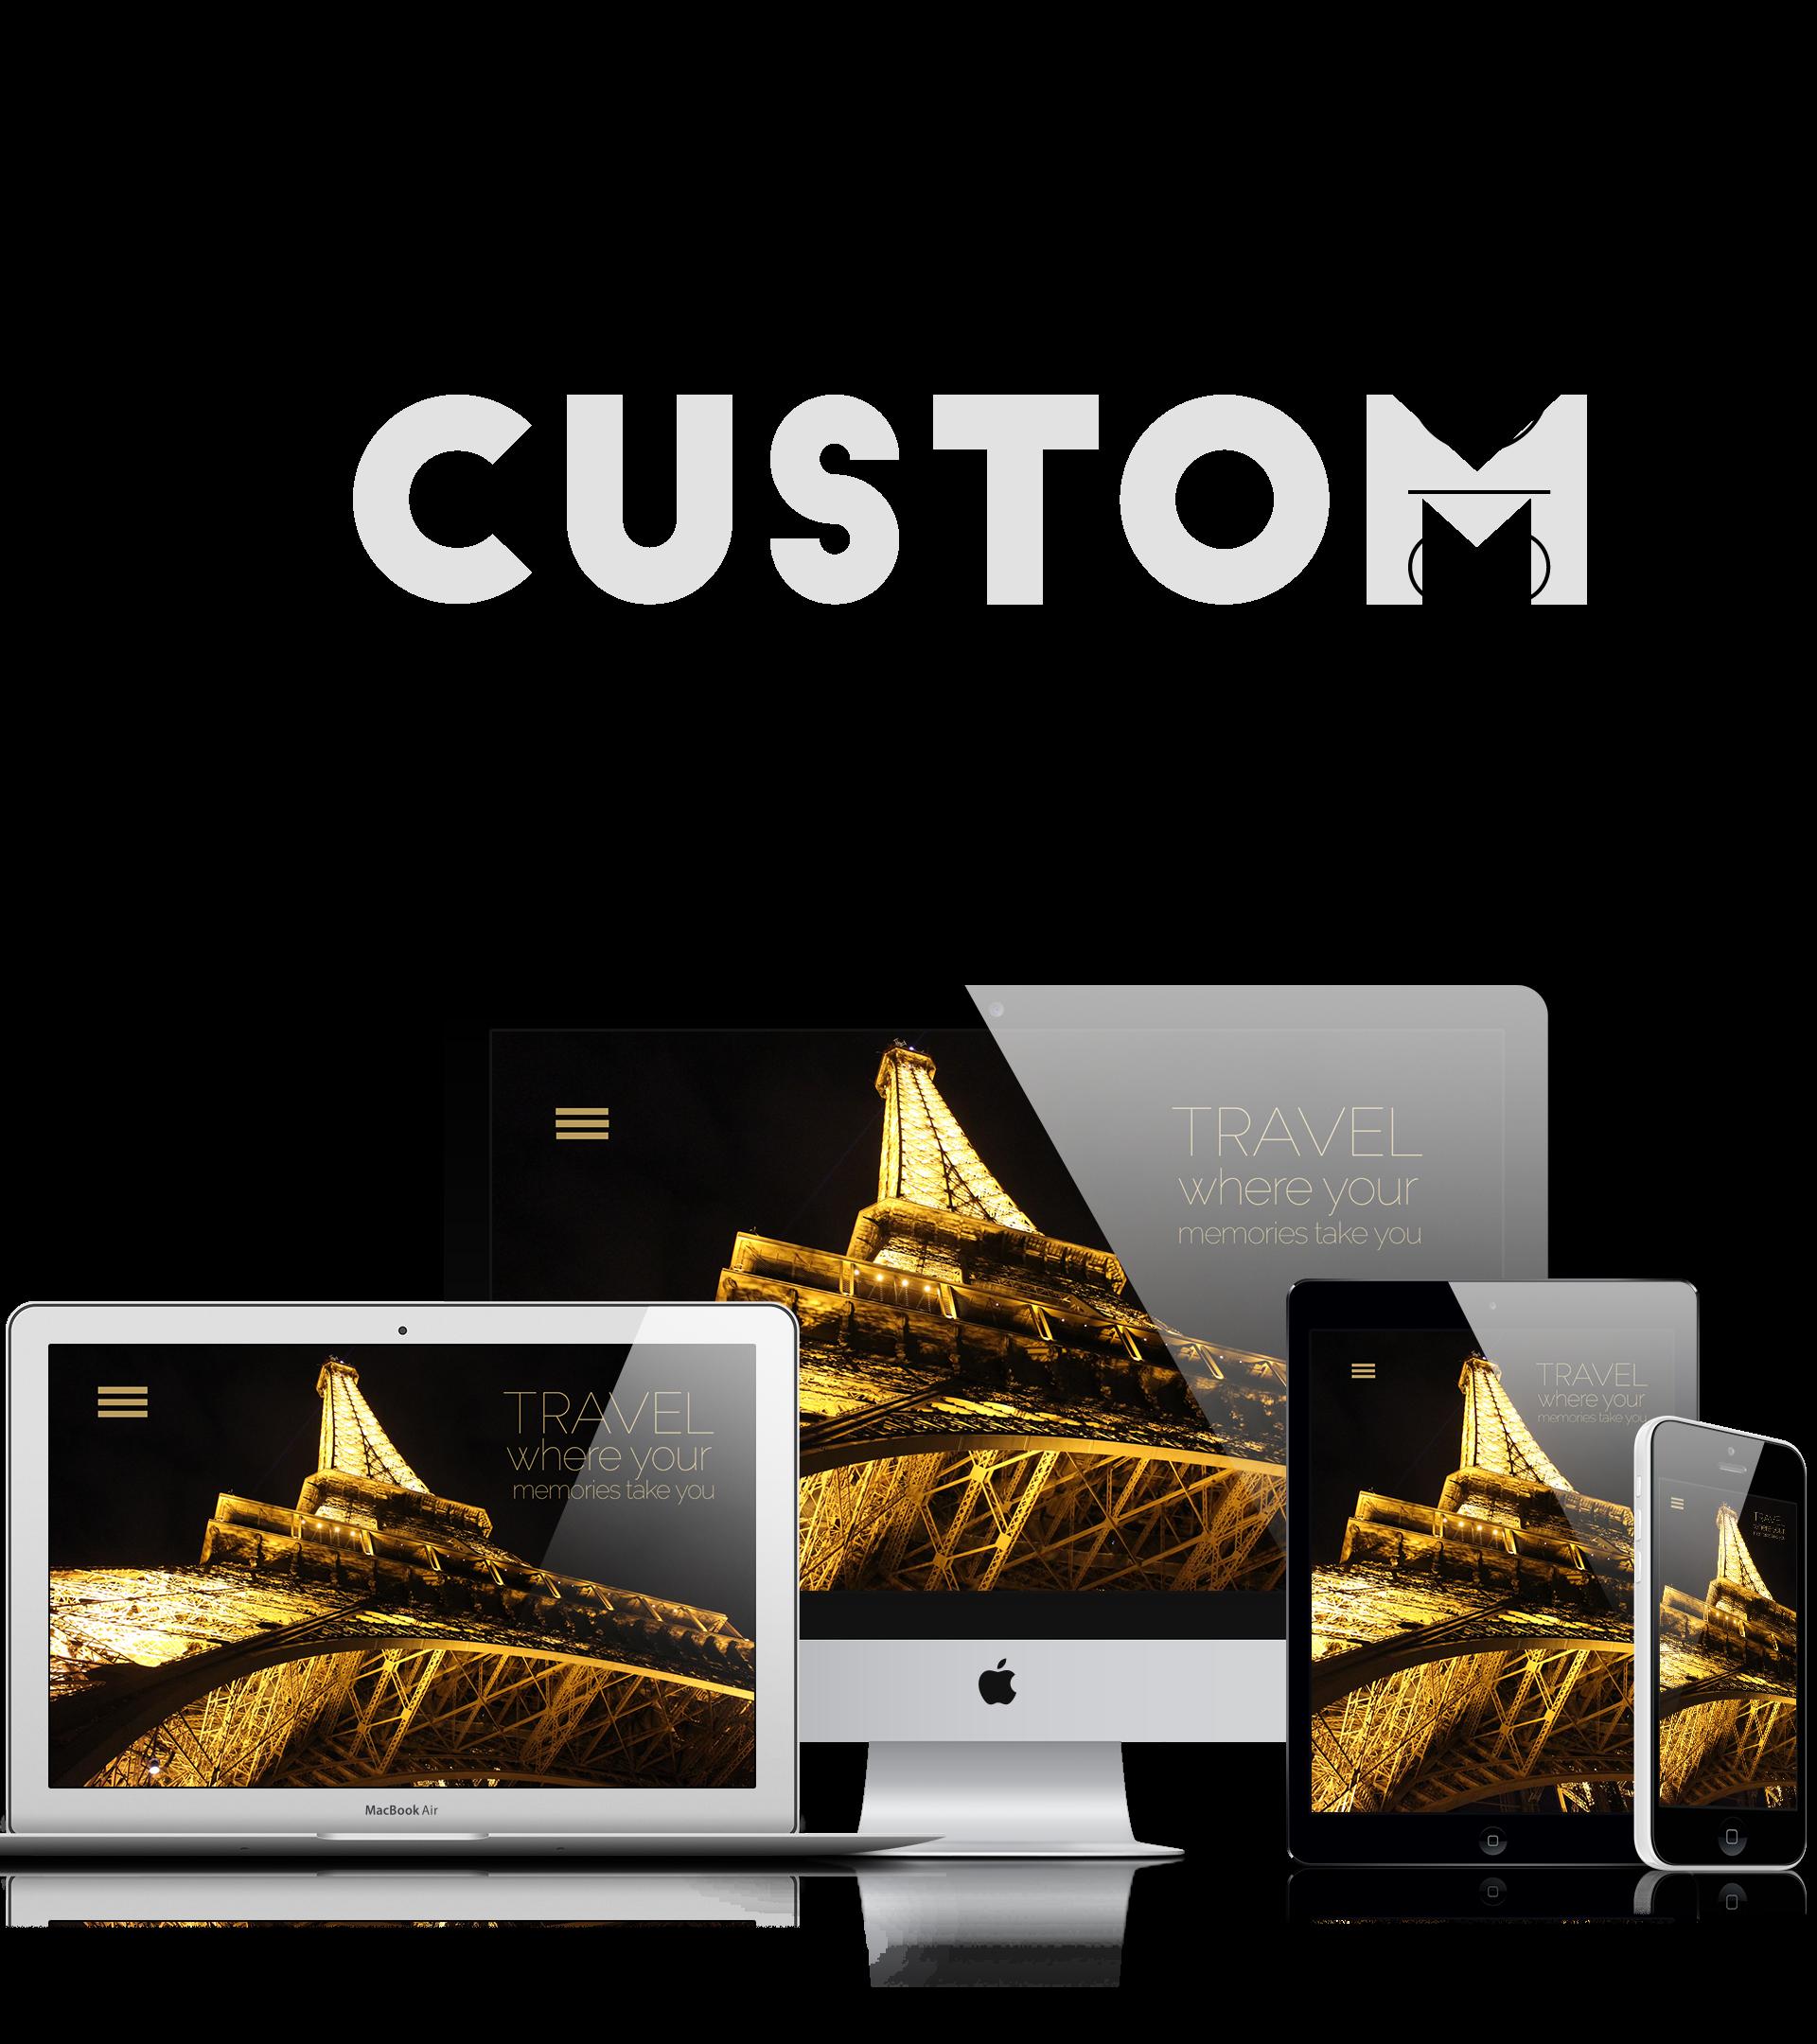 Custom Design - PixelUp